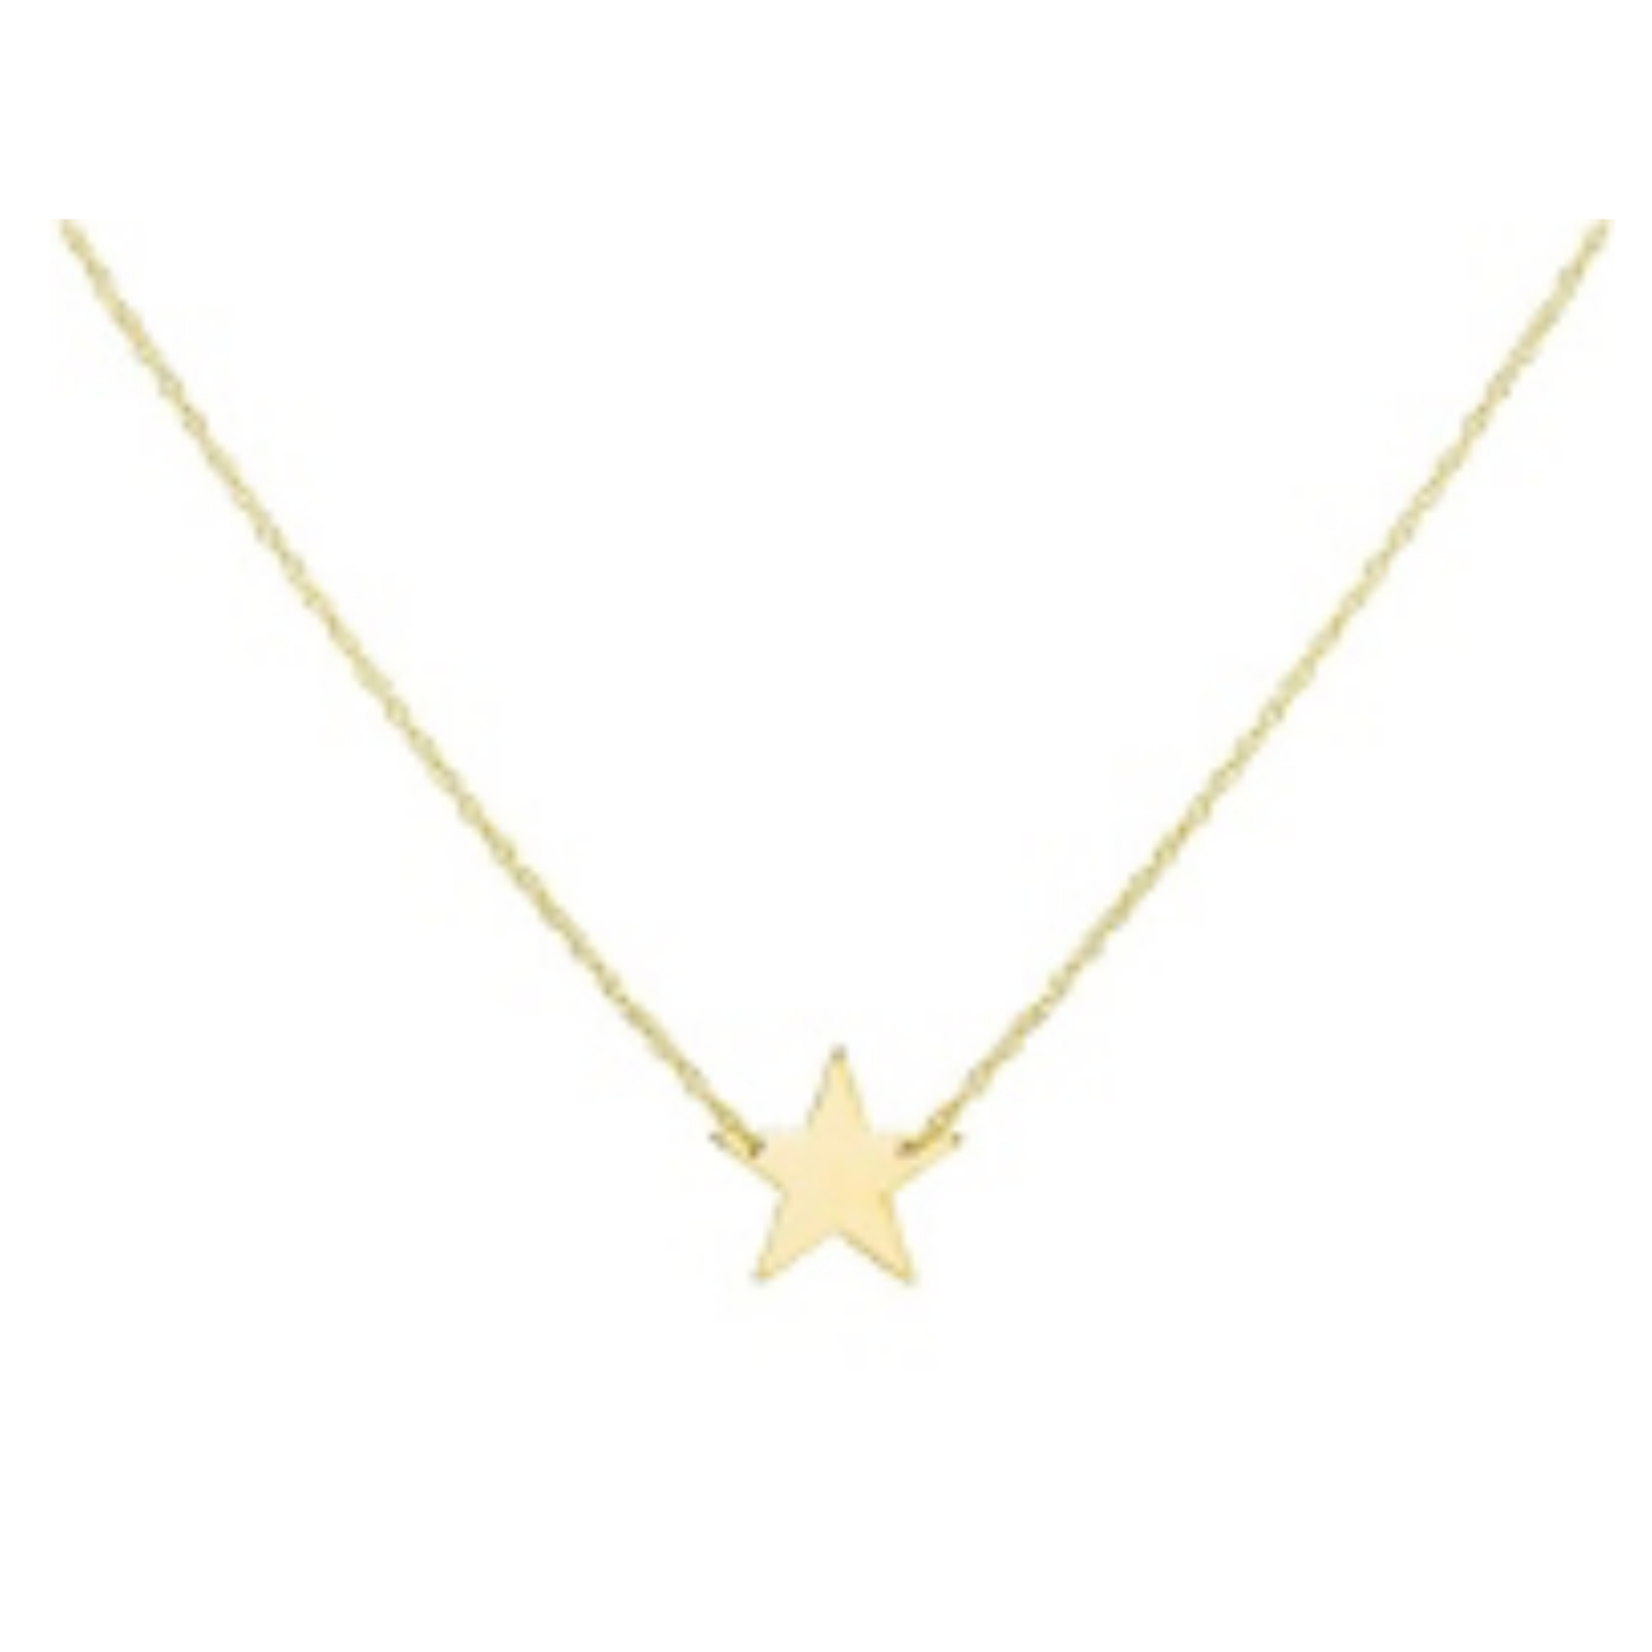 Adinas Mini Star Necklace 14K